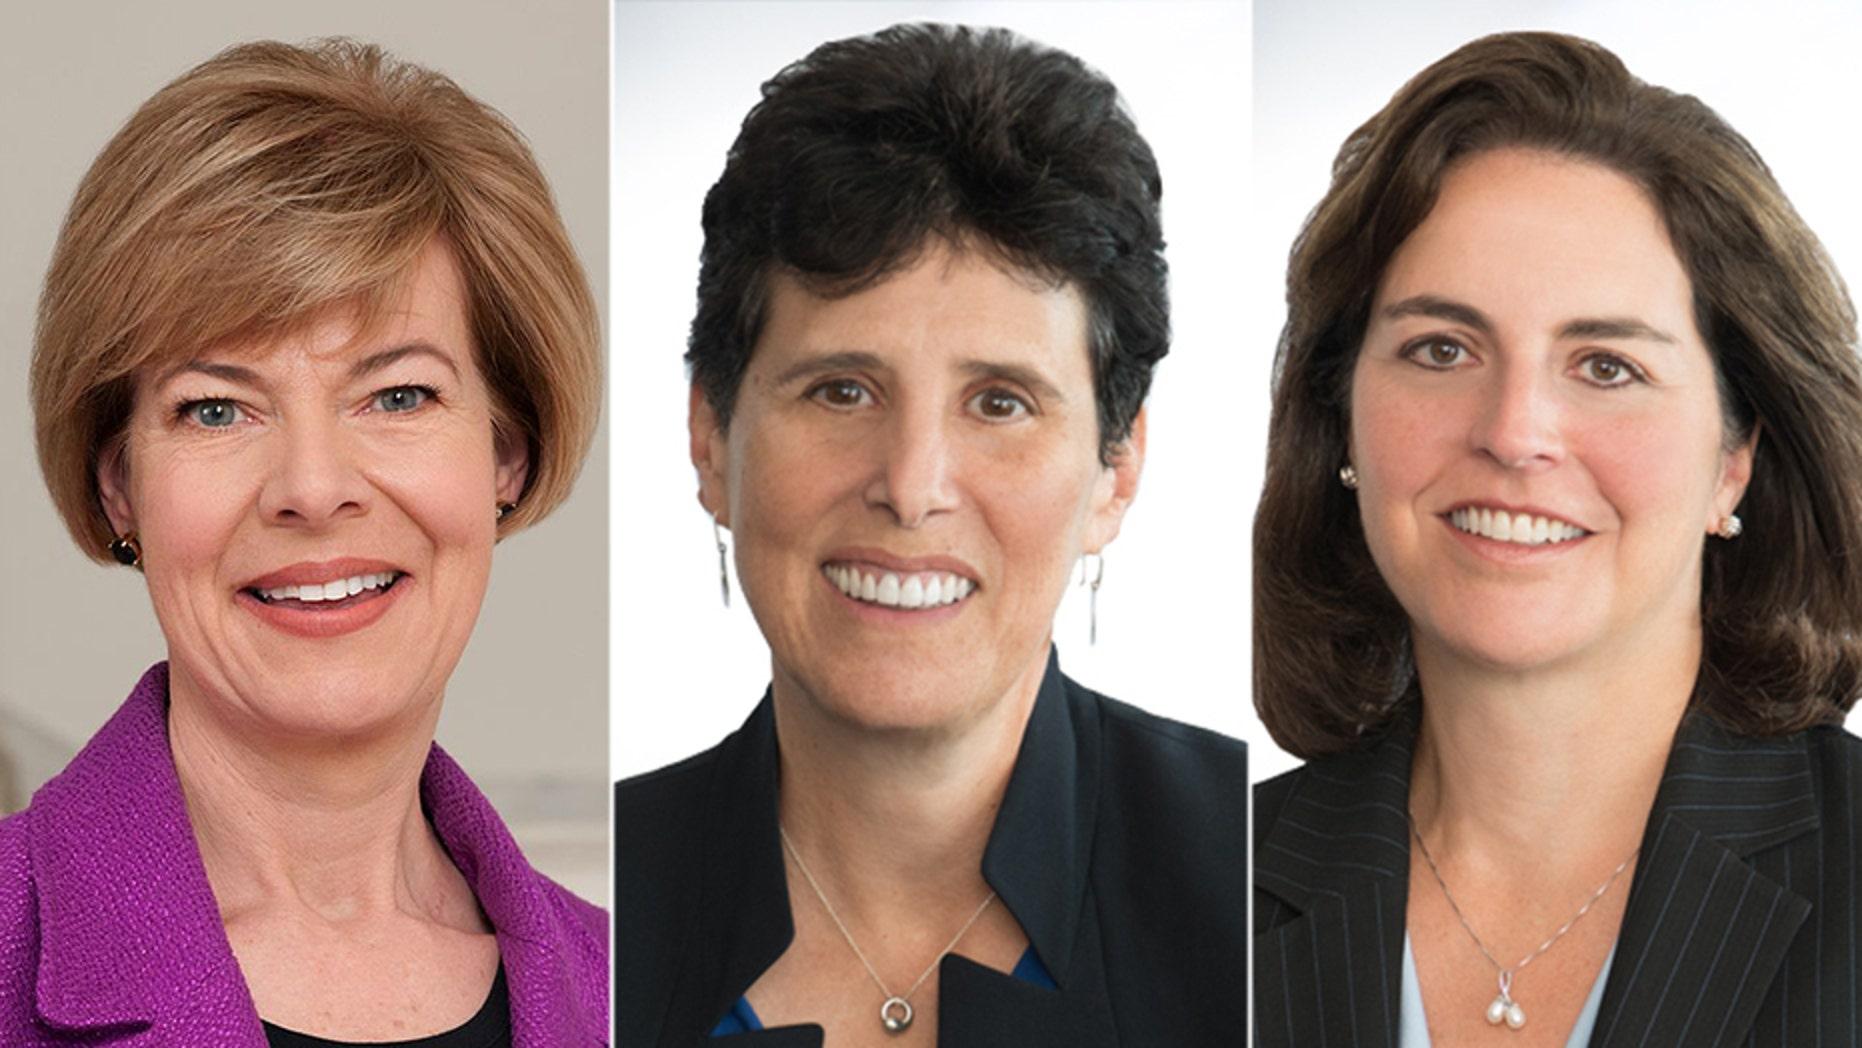 Wisconsin Democratic Sen. Tammy Baldwin (left) and attorneys Debra Katz (middle) and Lisa Banks (right).